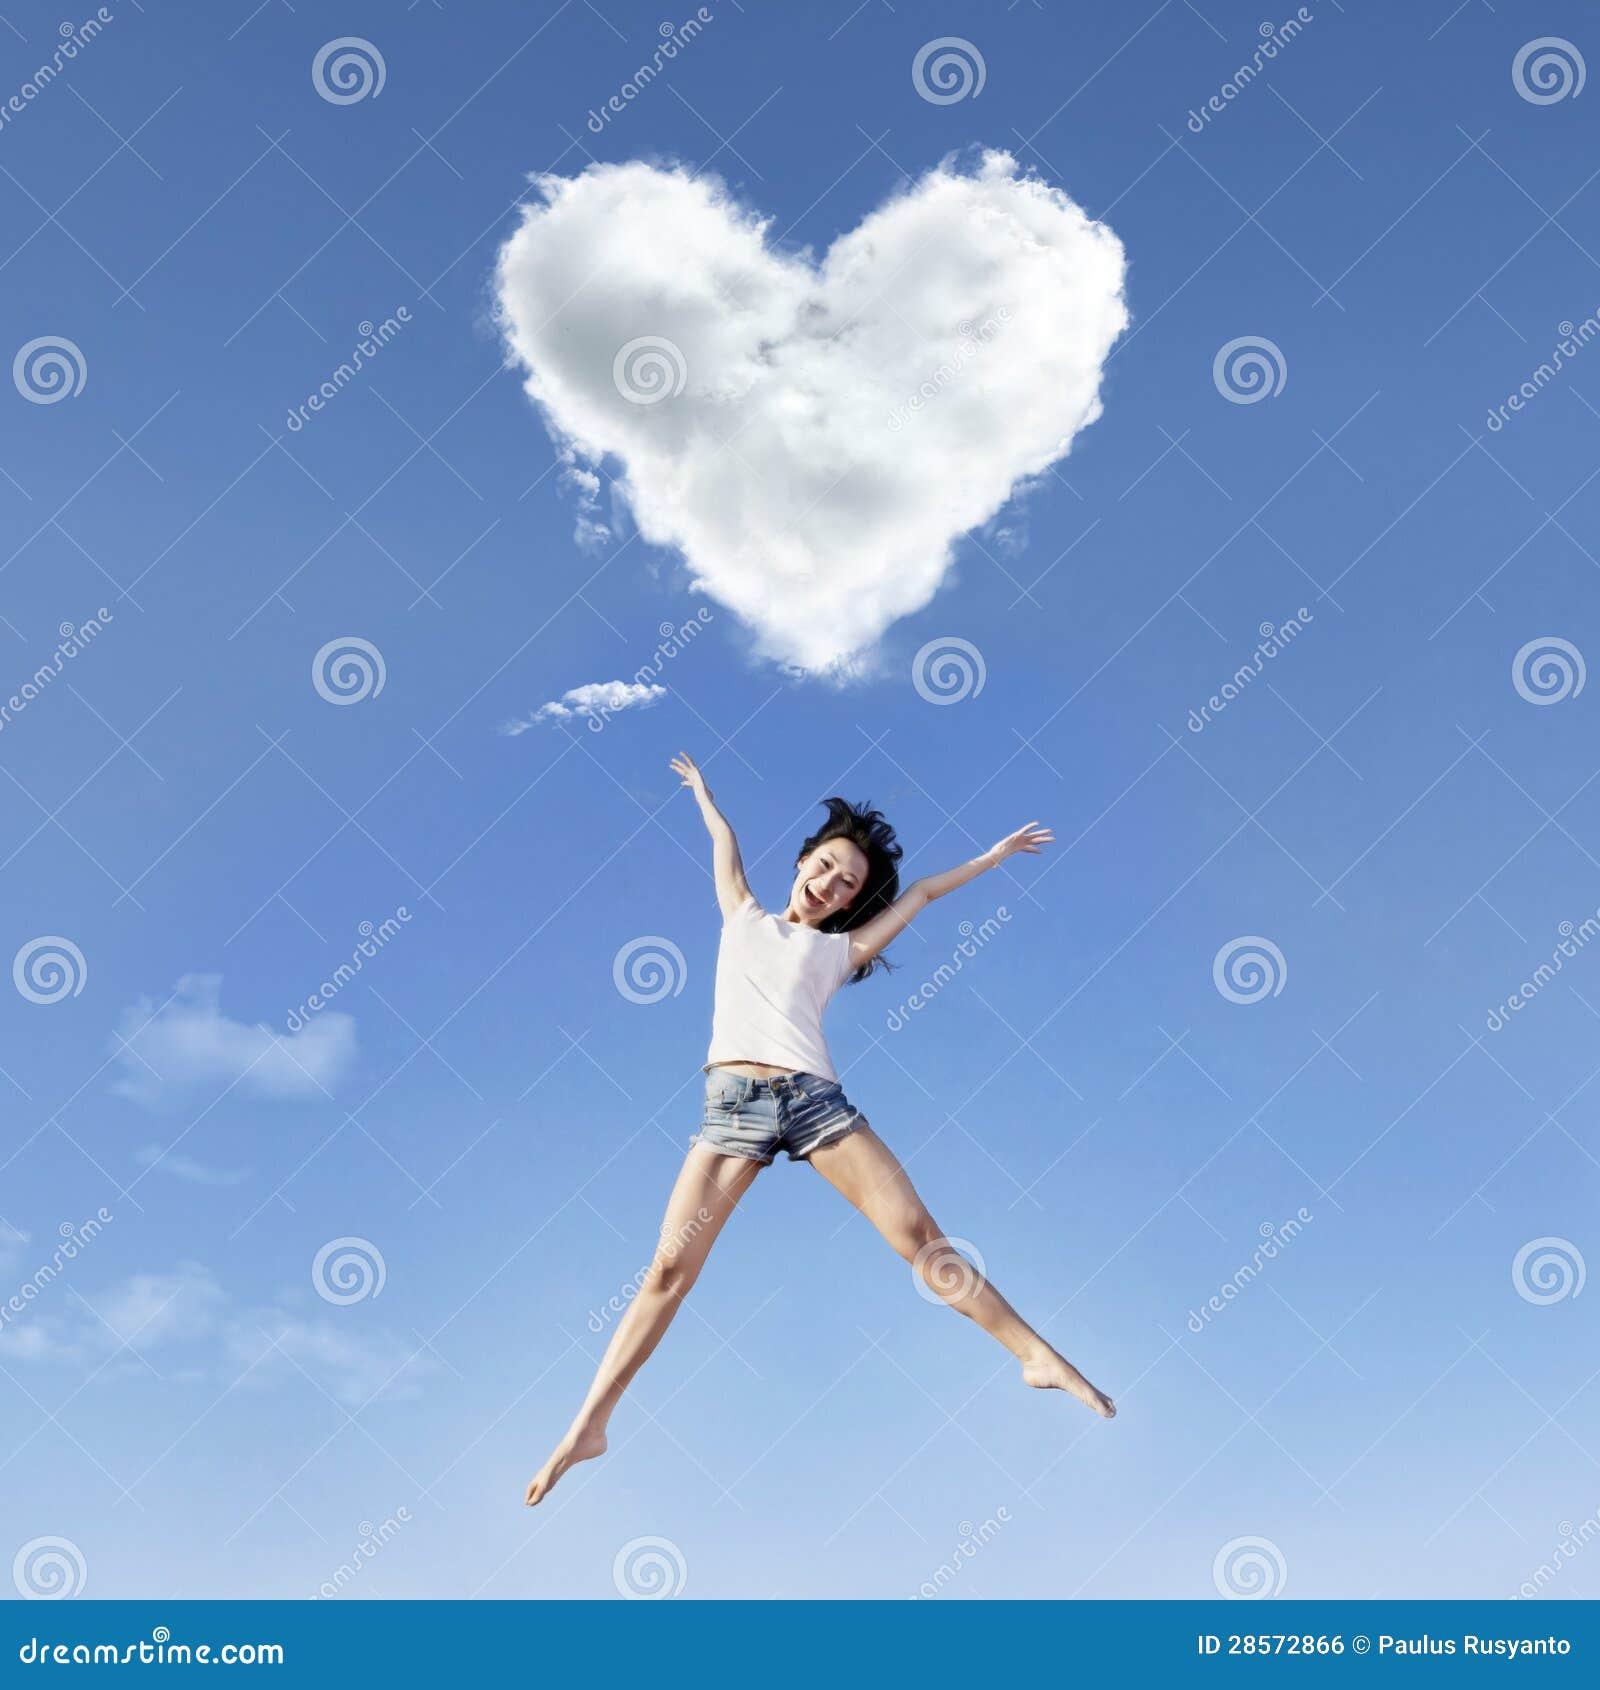 Girl big jump under heart clouds